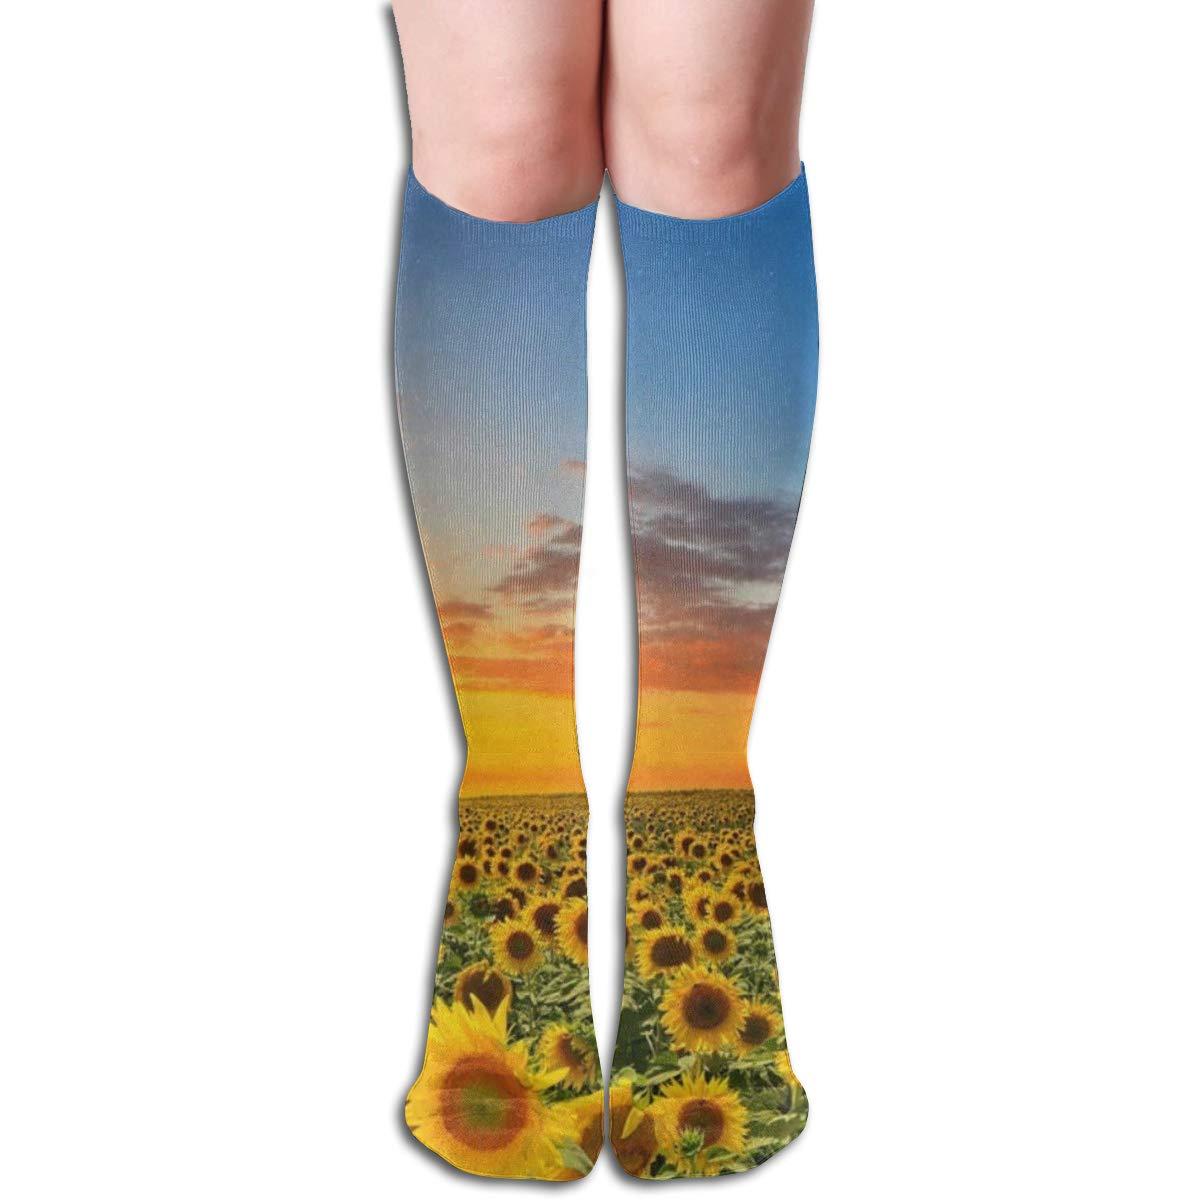 Women Socks Mid-Calf Sunflower Painting Winter Great For Decor